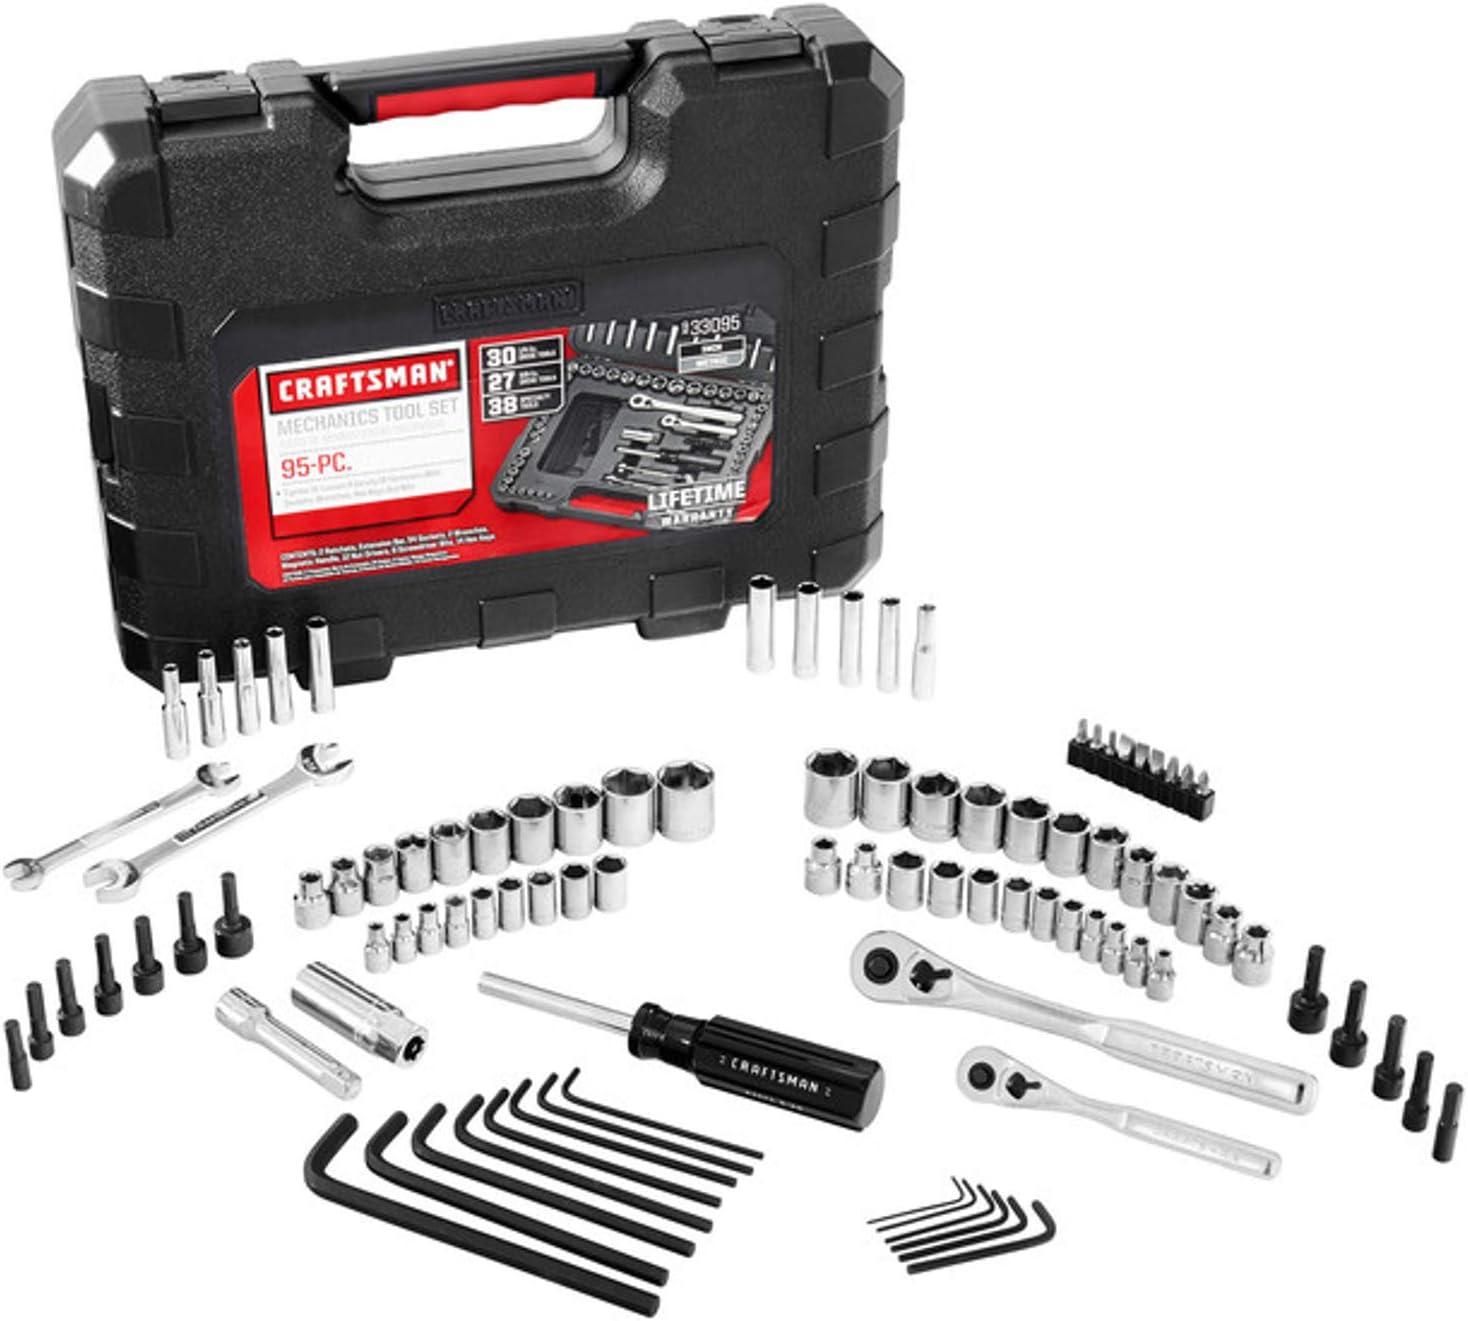 CMMT12021 SAE // Metric 83-Piece 1//4-Inch Drive CRAFTSMAN Mechanics Tool Set